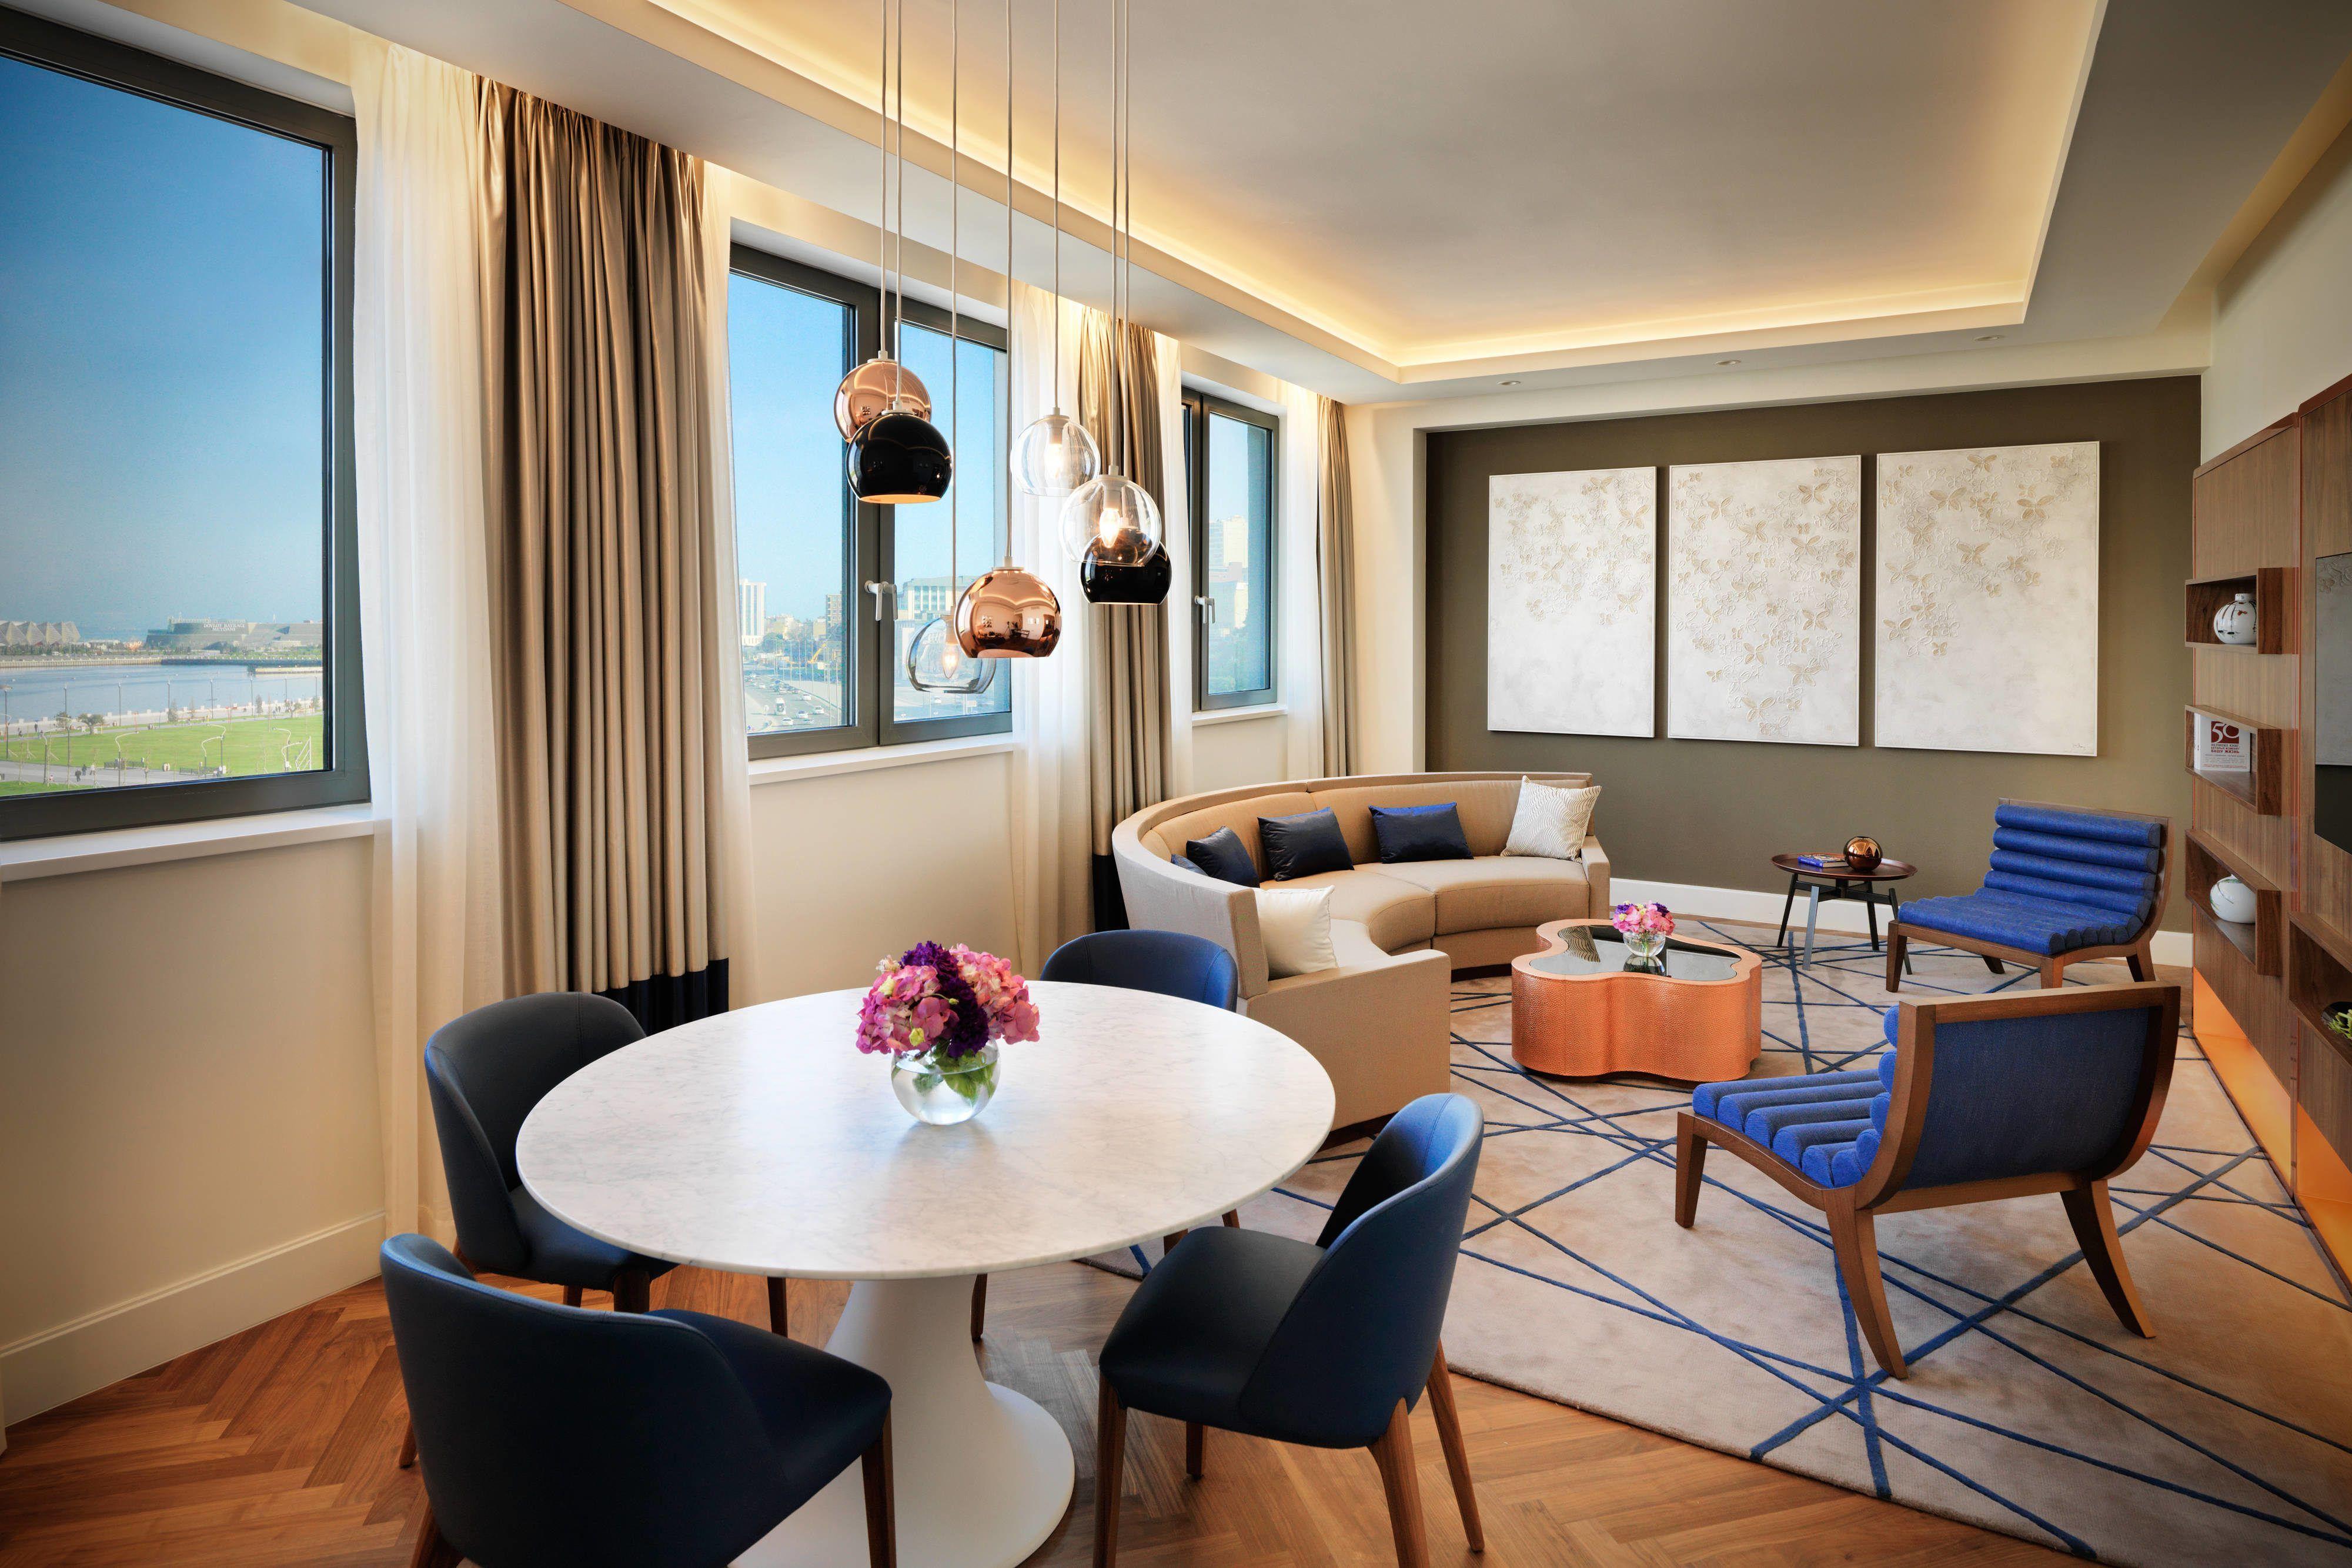 Intourist Hotel Baku Autograph Collection Khazar Suite Living Room Guest Beautiful Traveling Hotel Home Decor Baku